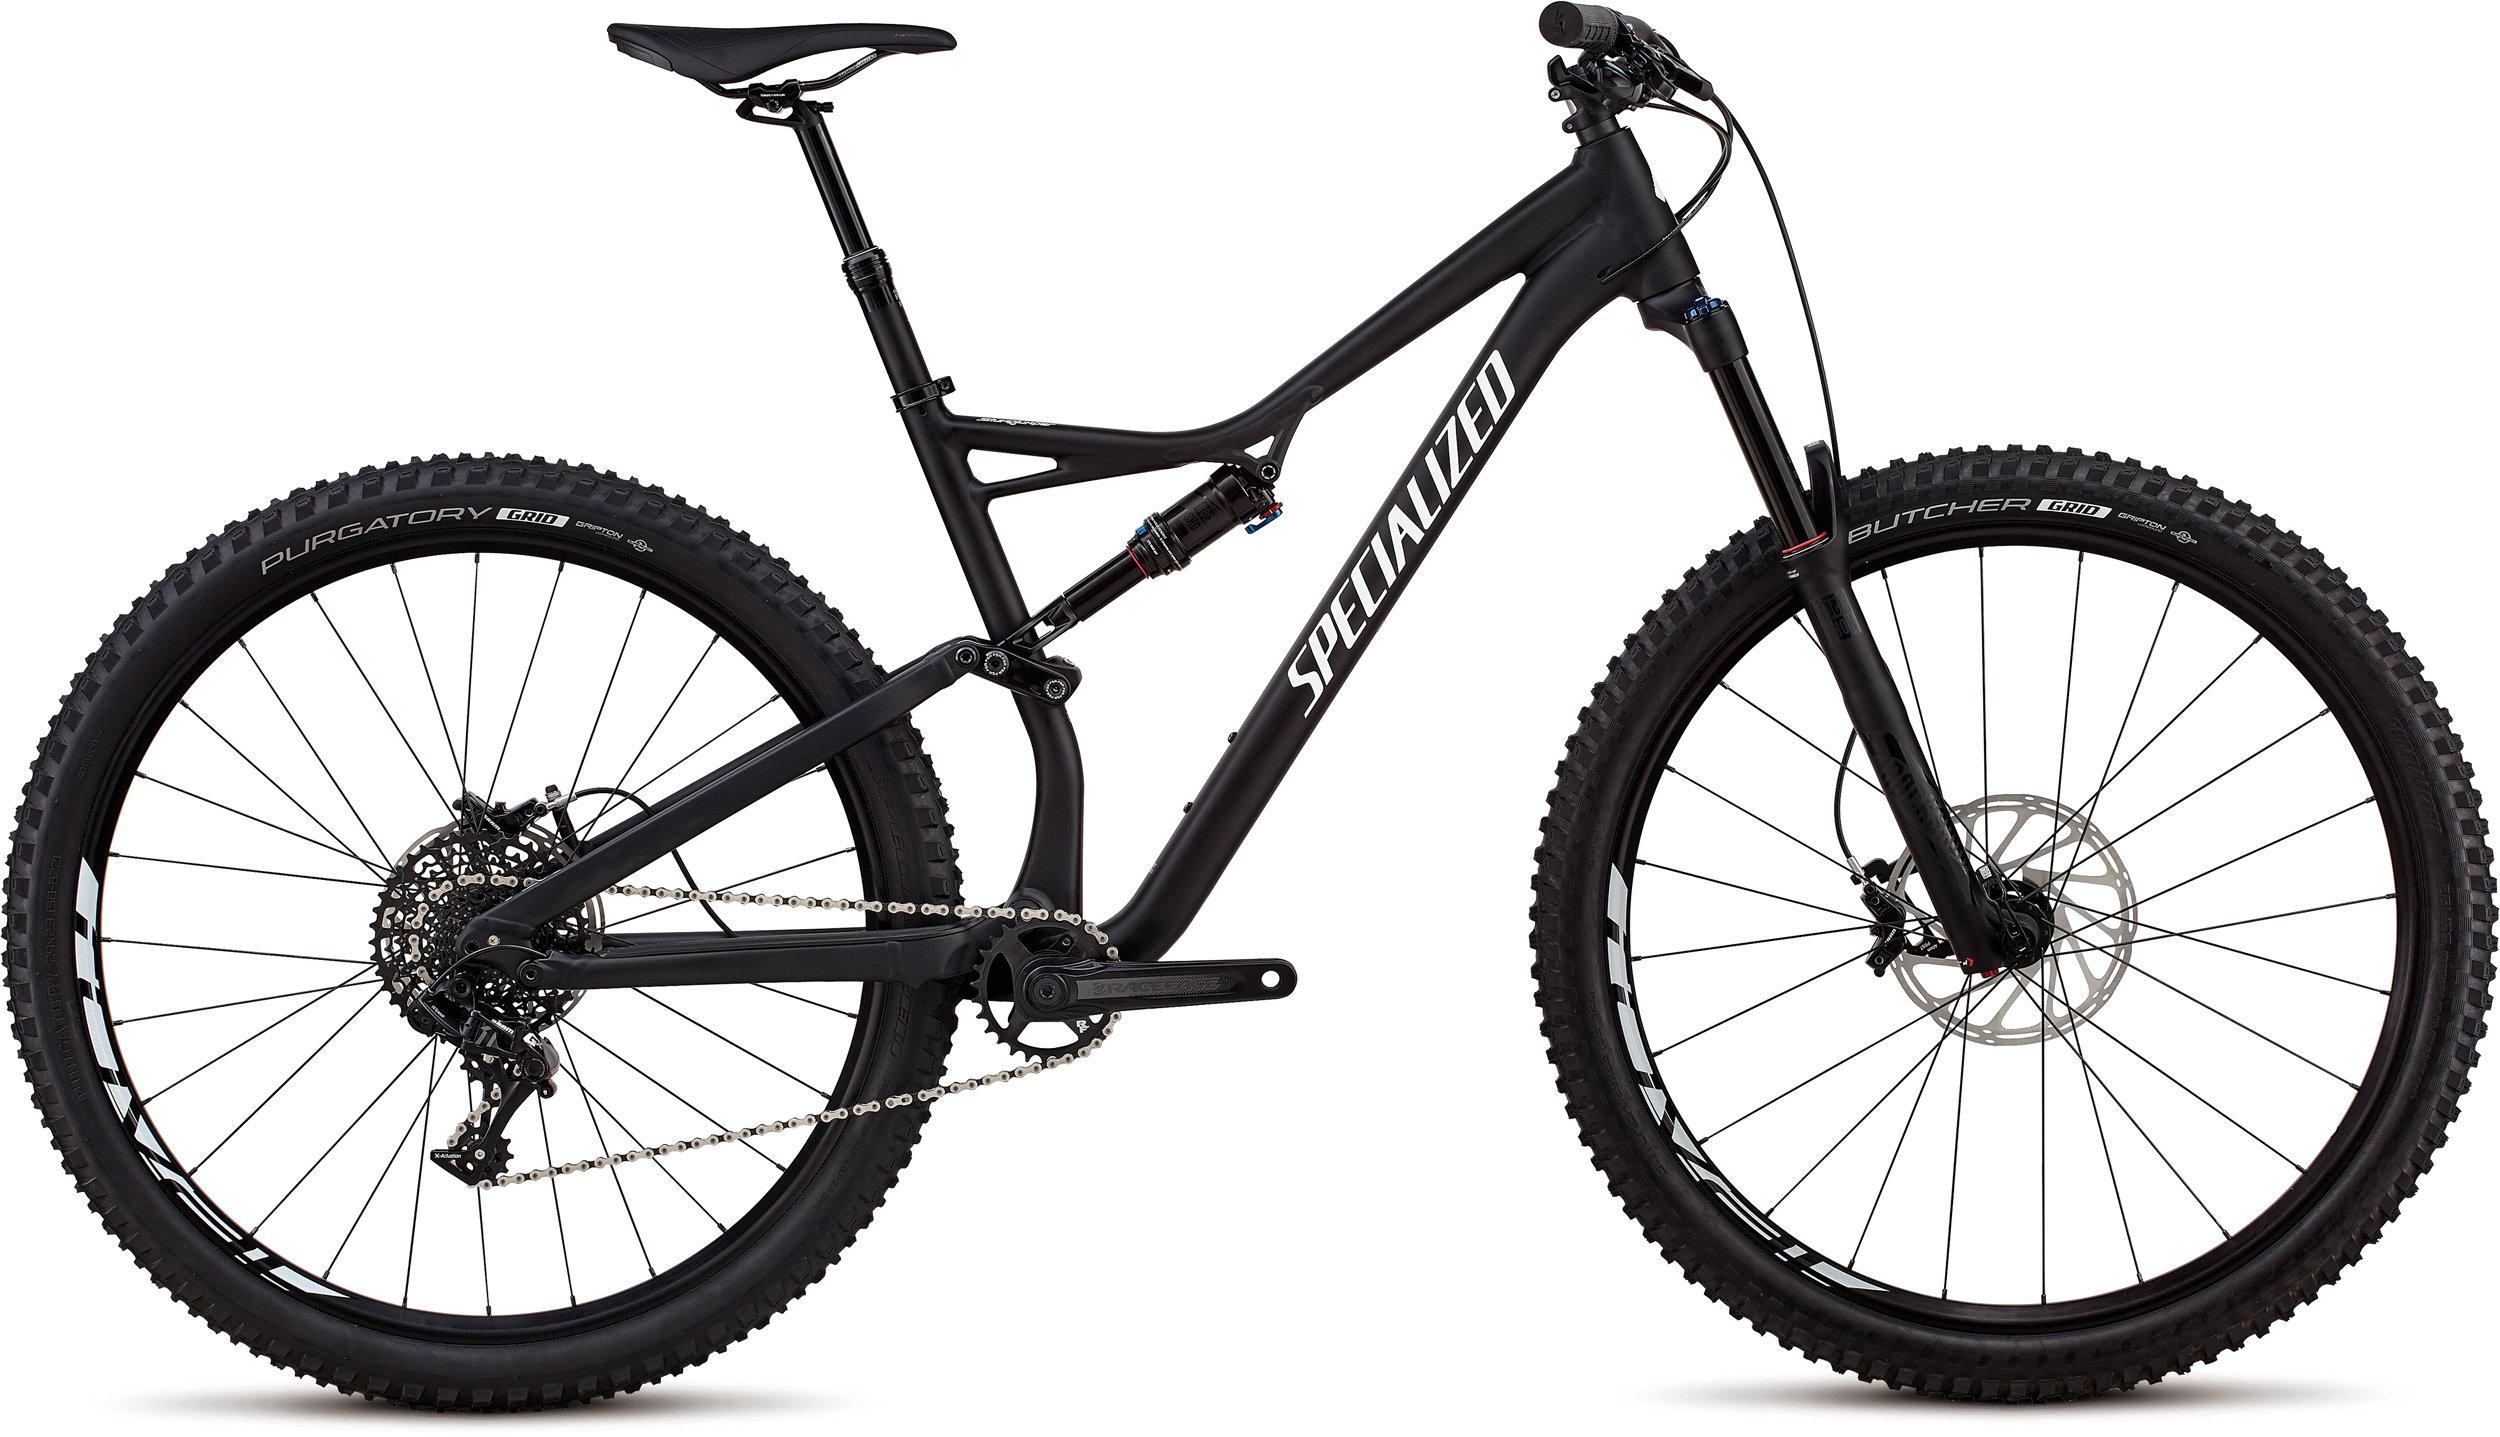 Specialized Stumpjumper Comp Alloy 29/6Fattie SATIN BLACK / WHITE CLEAN S - Bike Maniac